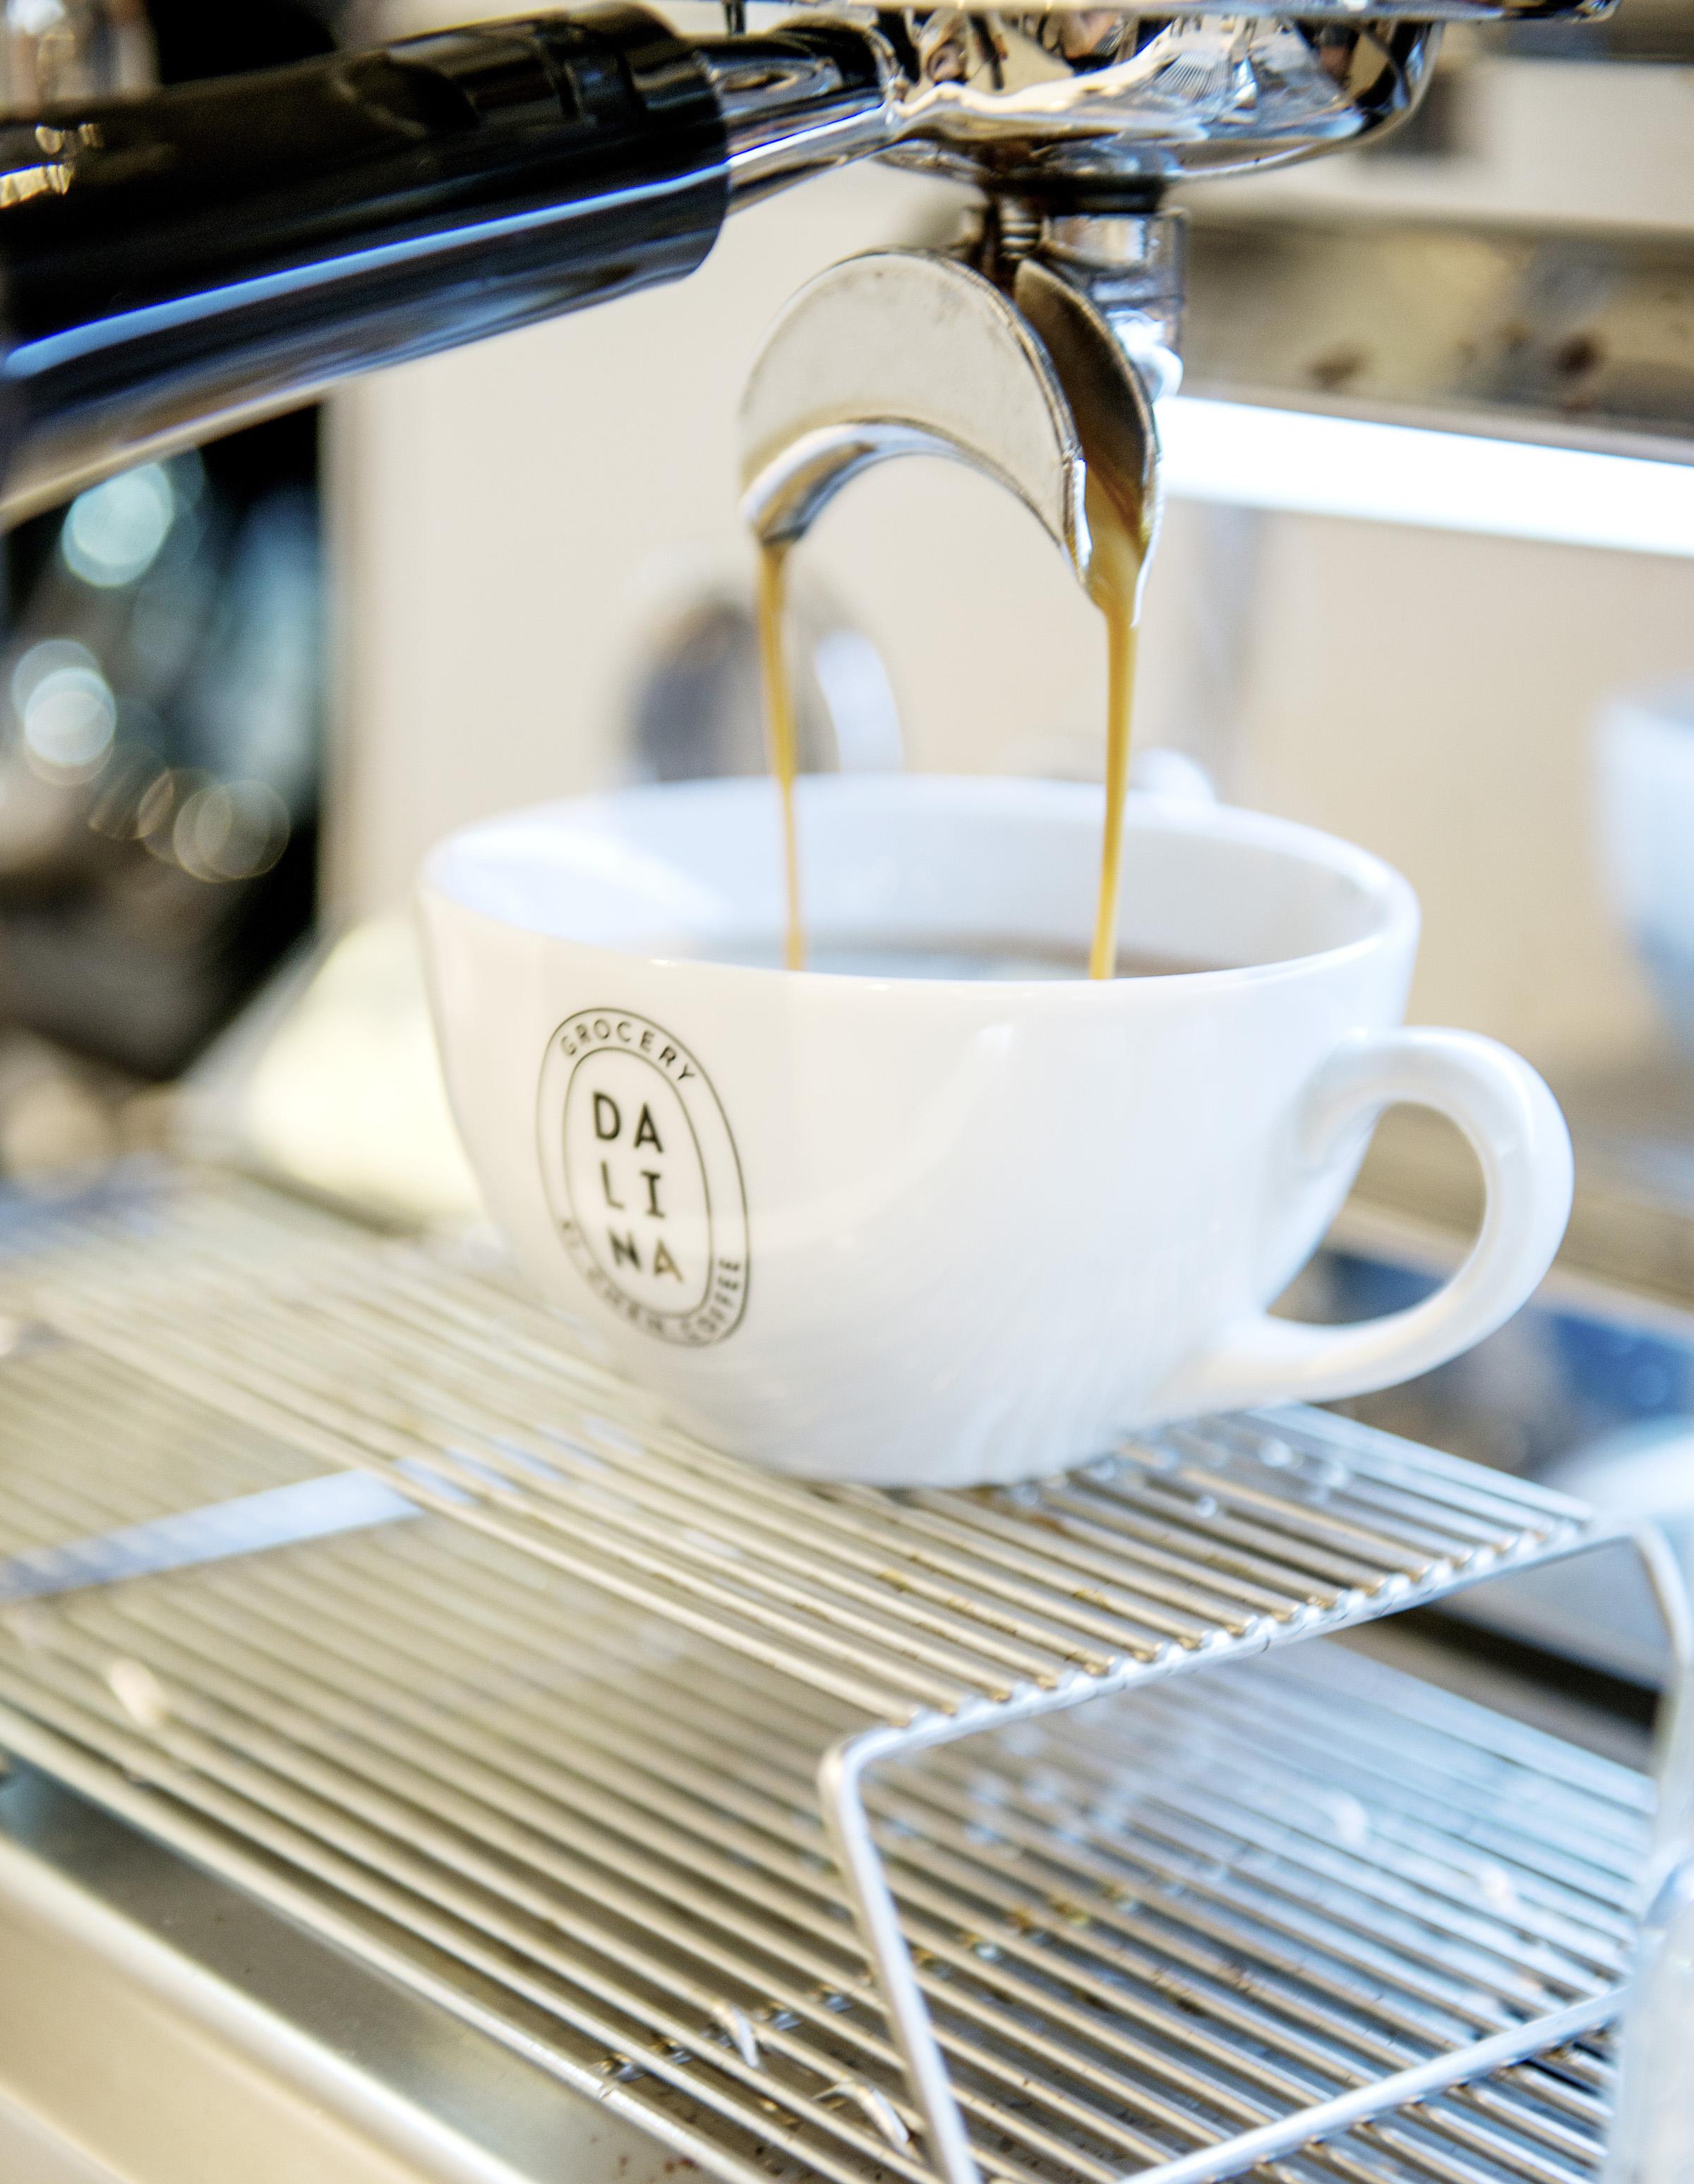 dalina espresso